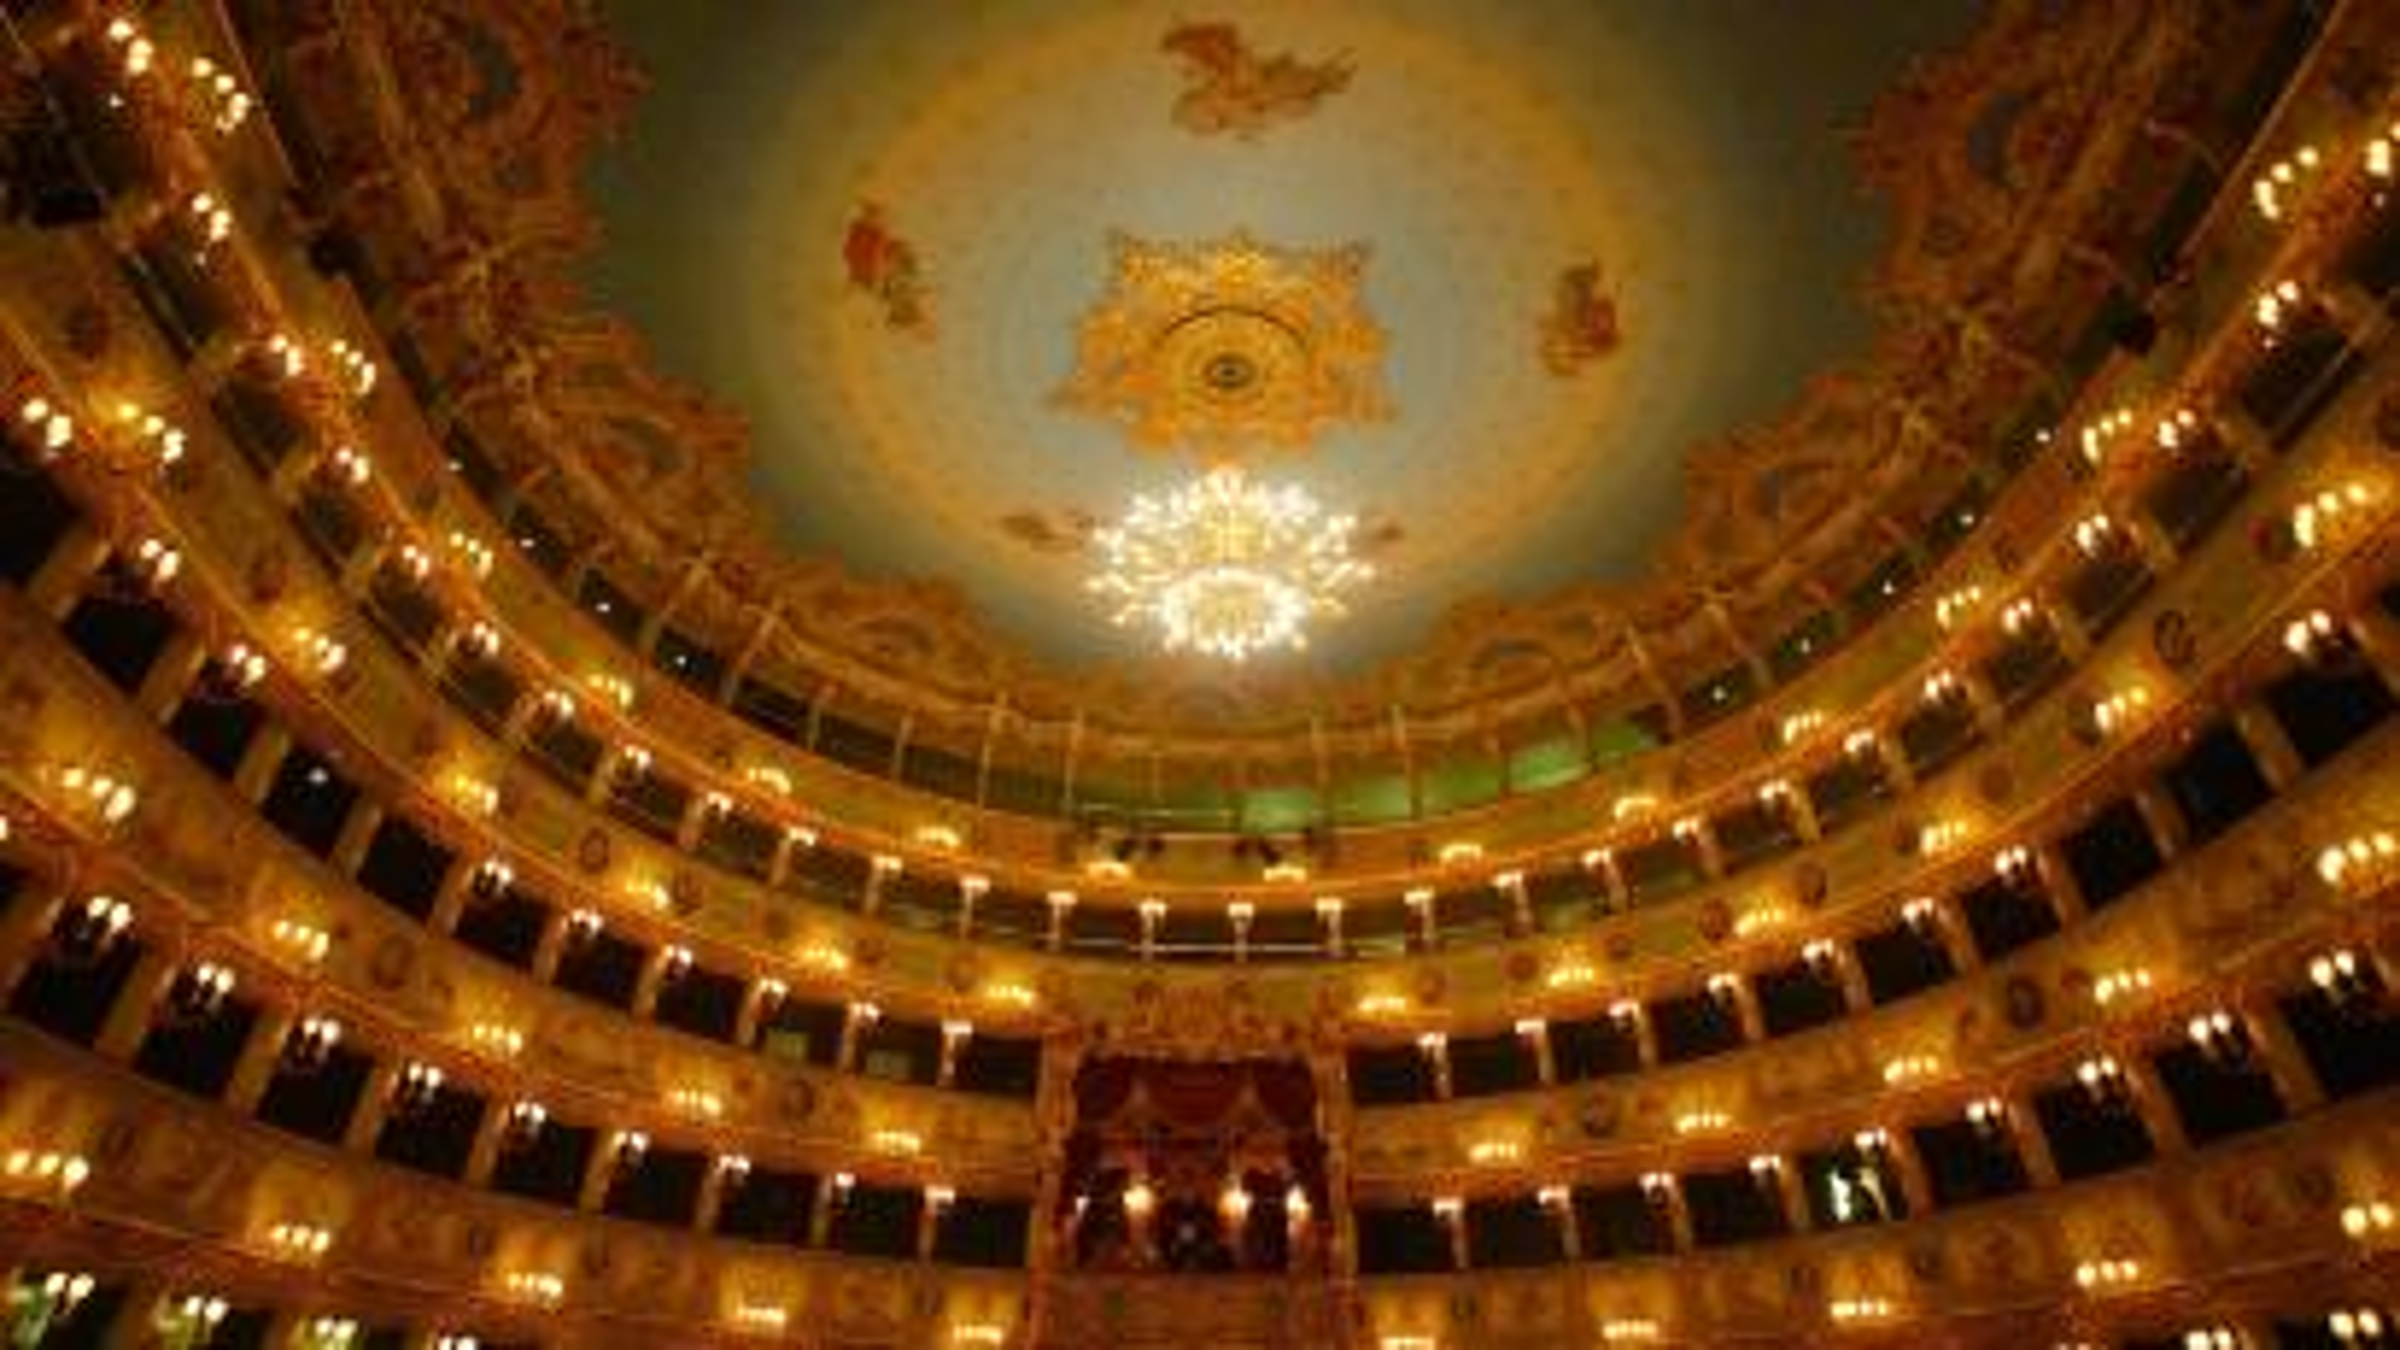 La Fenice in Venice